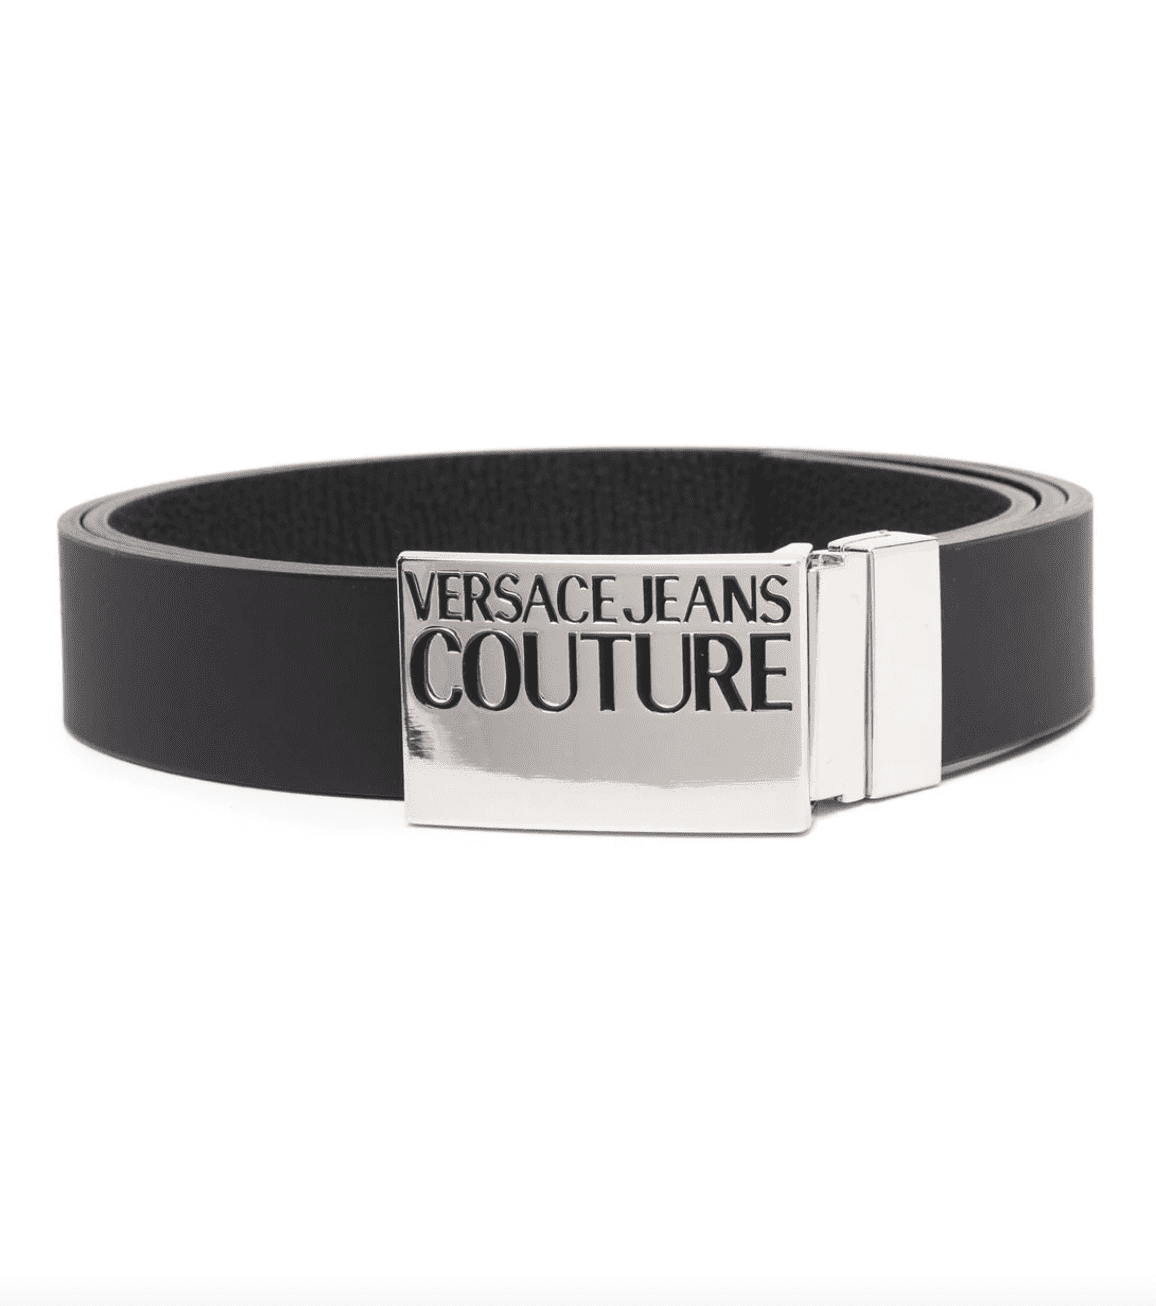 Versace Jeans Couture Riem Silver